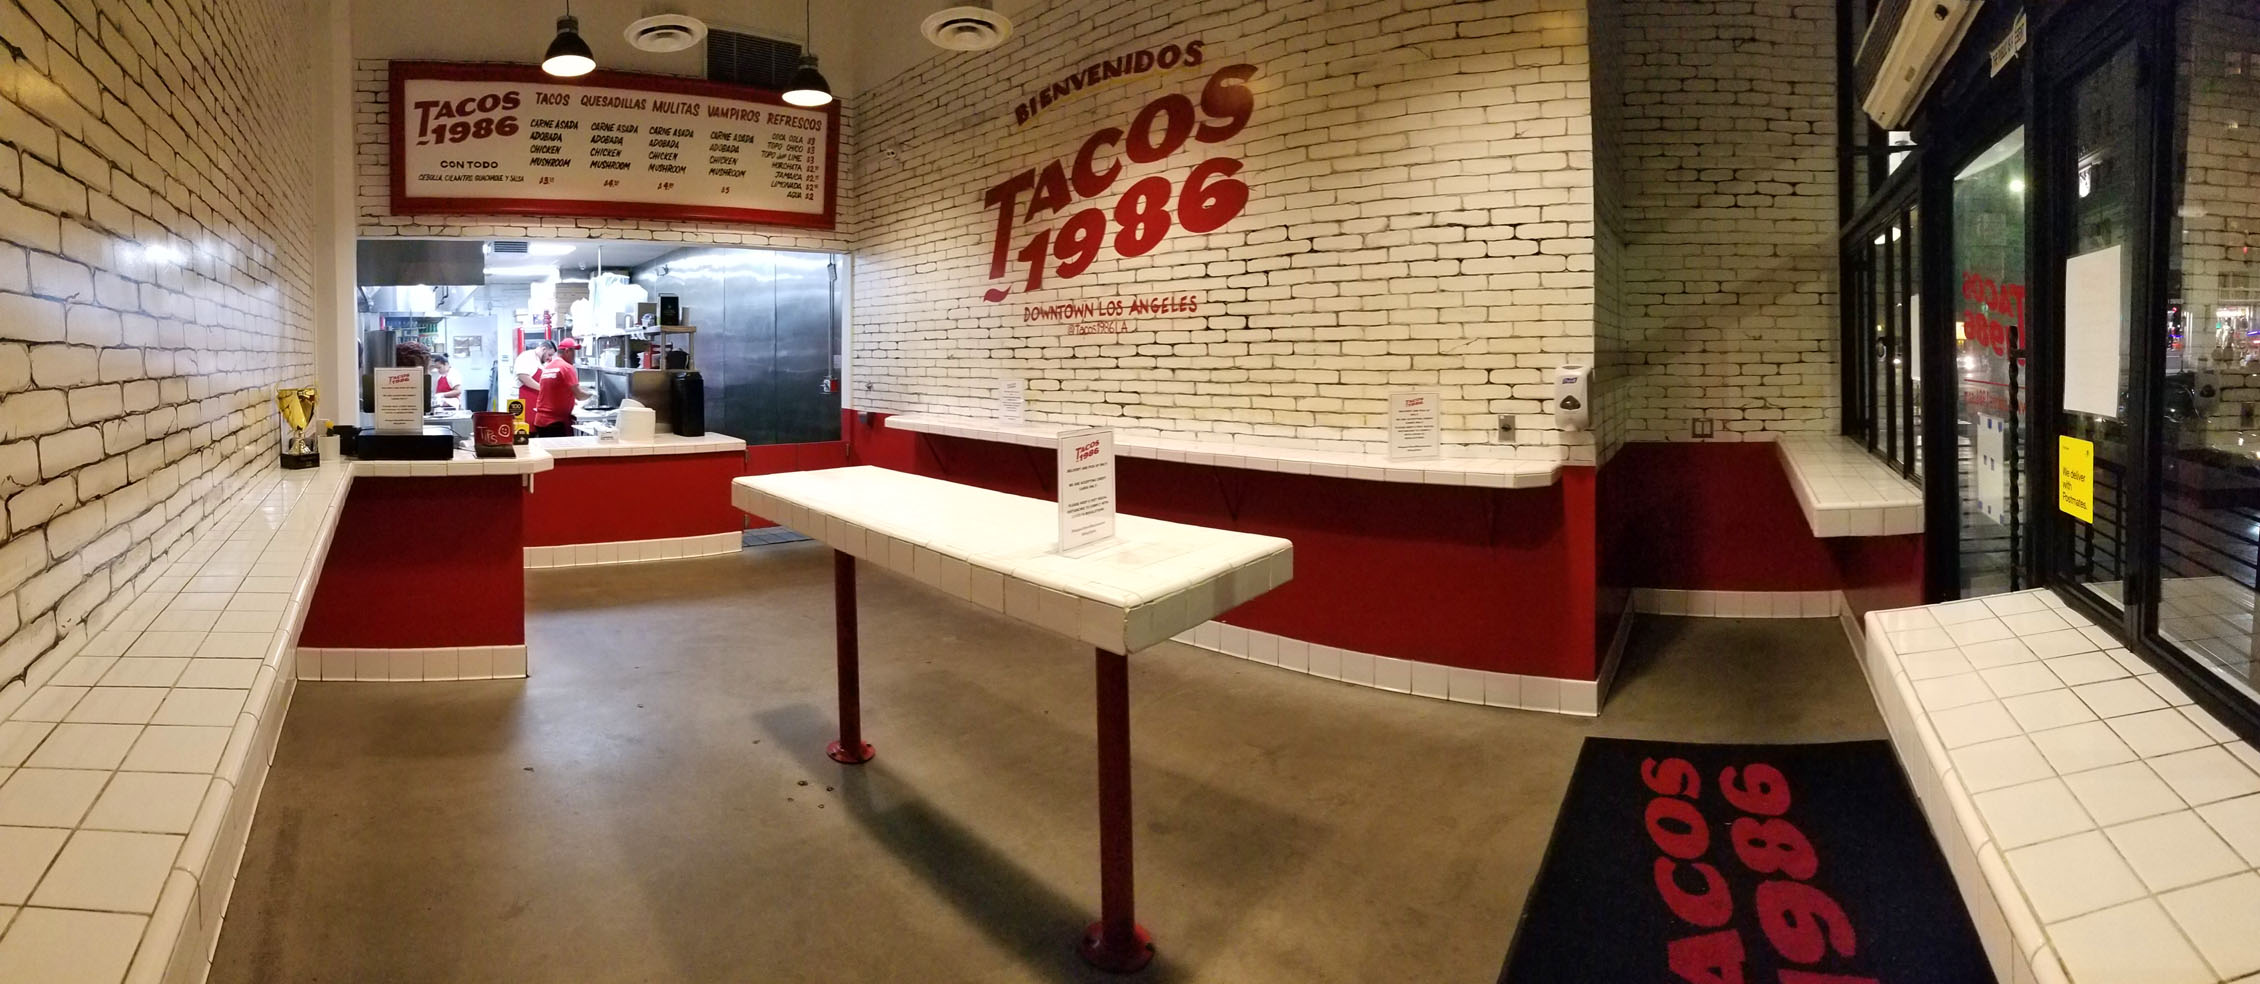 Tacos 1986 Interior